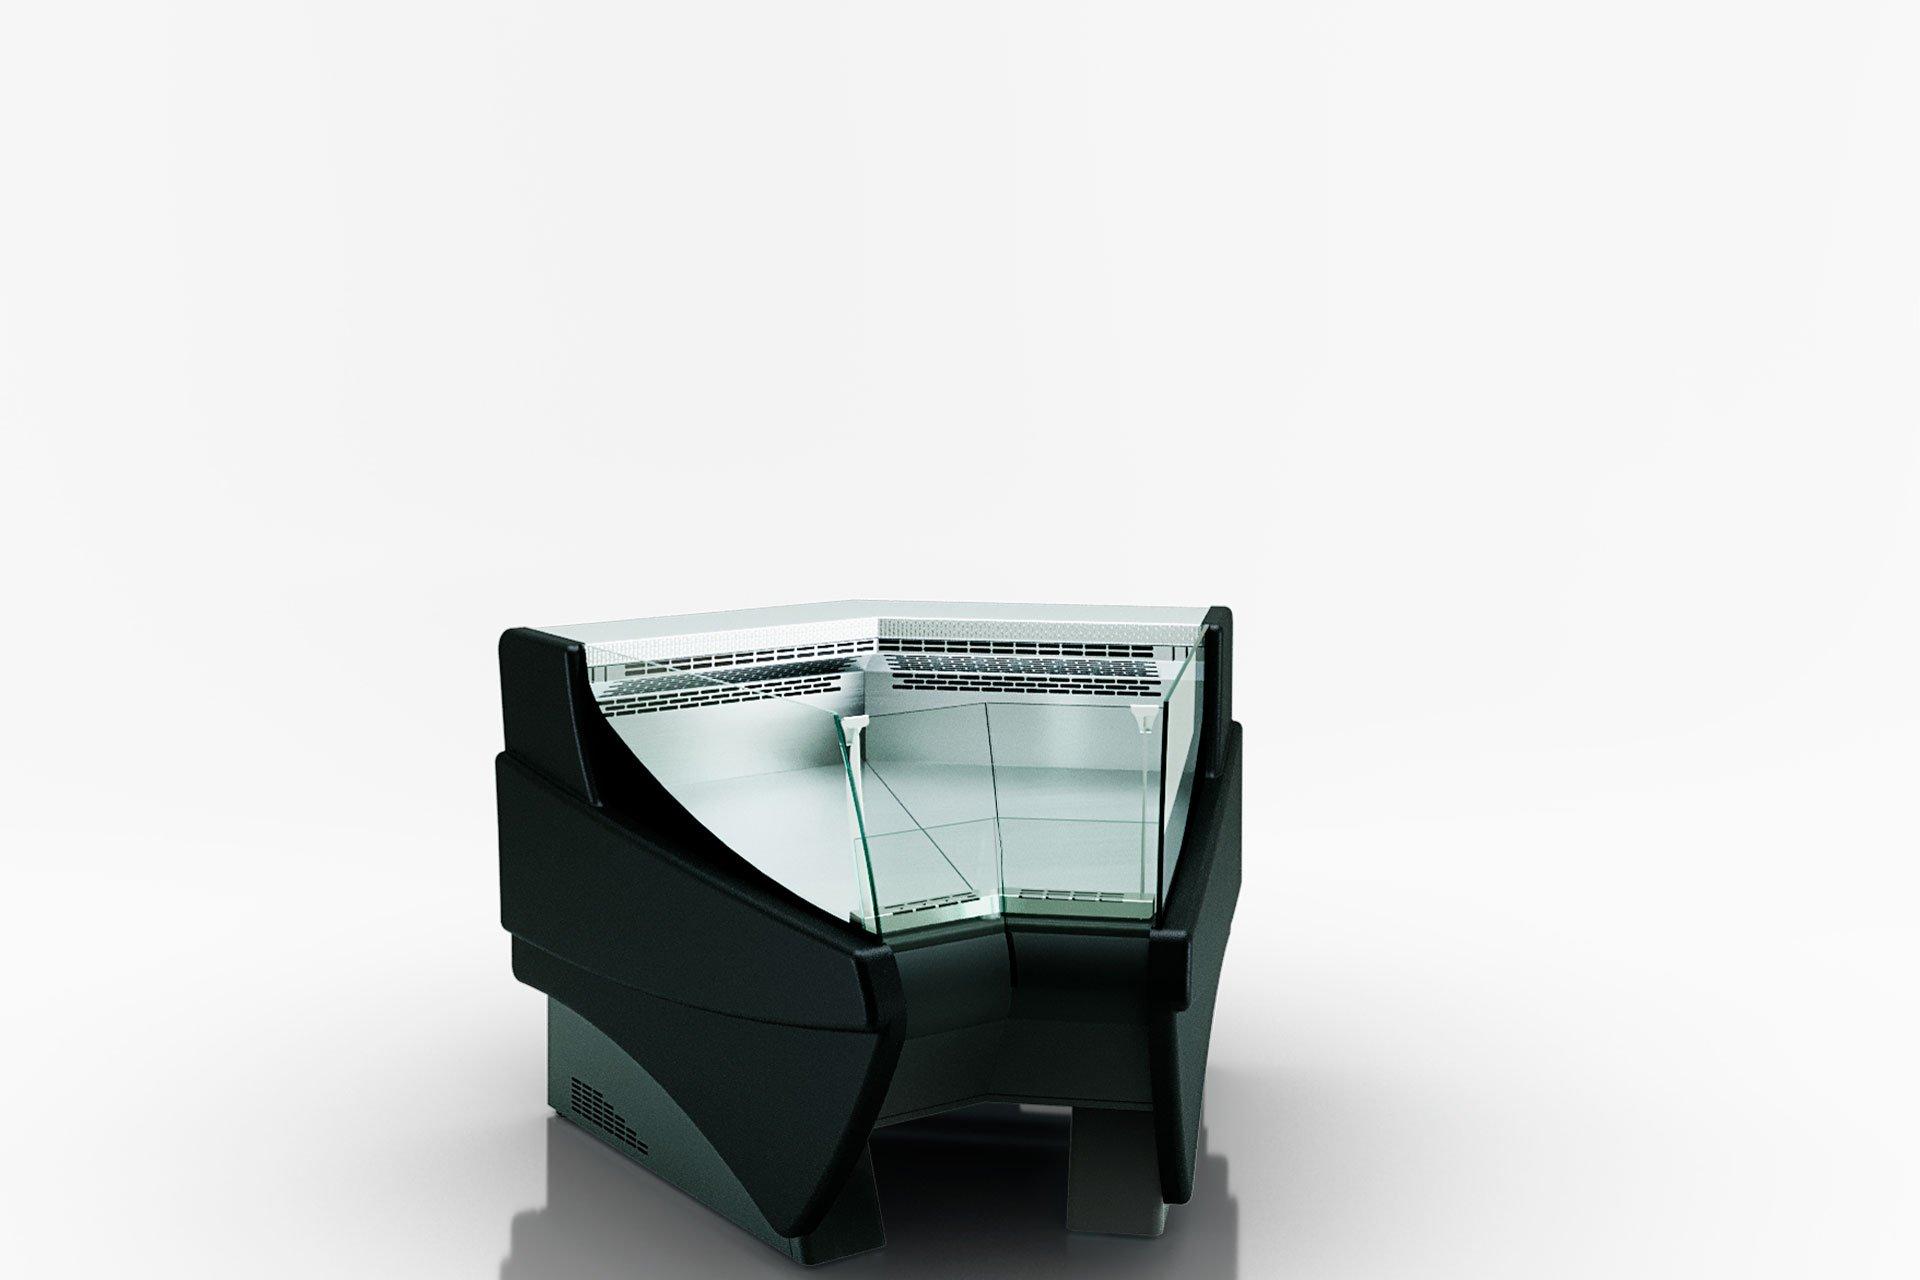 Вітрина Symphony luxe MG 120 deli self 085-DLM-IS45